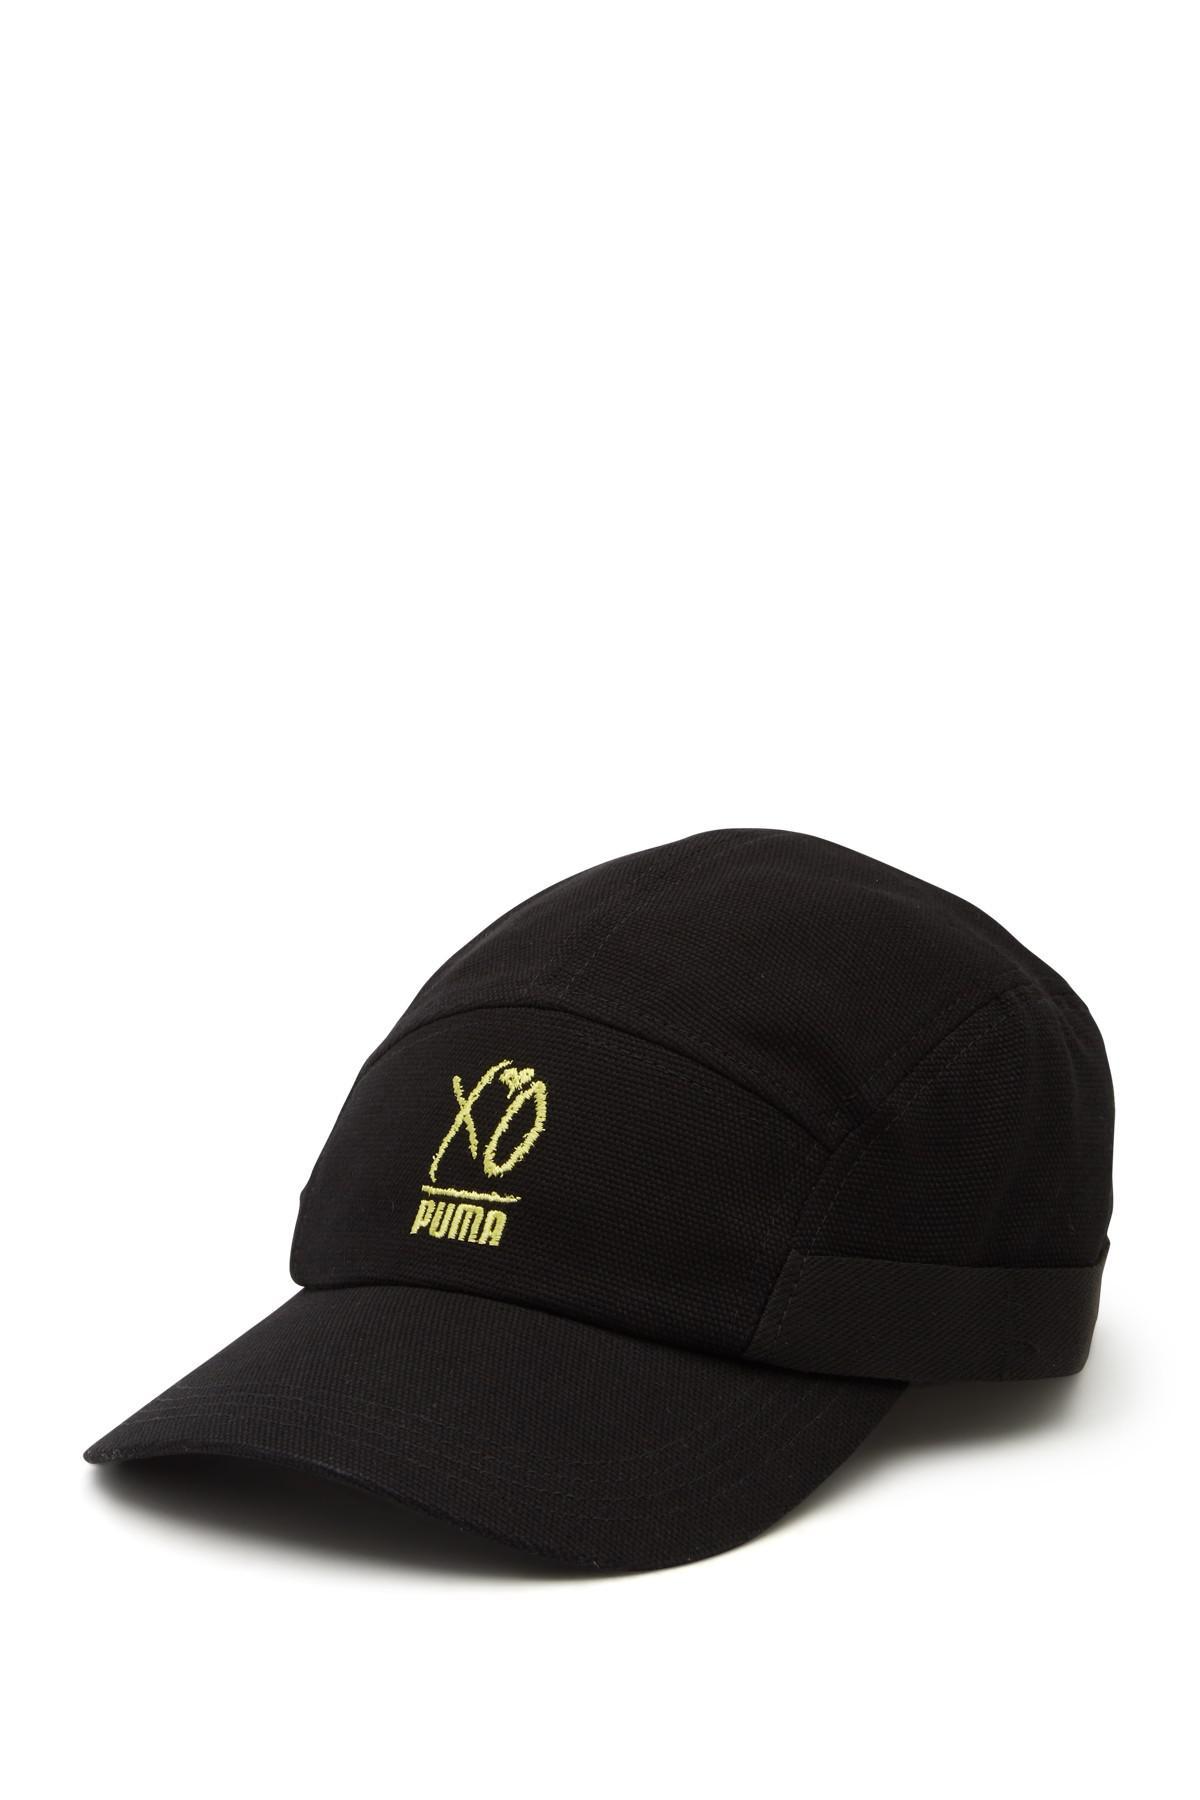 18880edf79a Lyst - PUMA X Xo By The Weeknd Canvas Baseball Cap in Black for Men